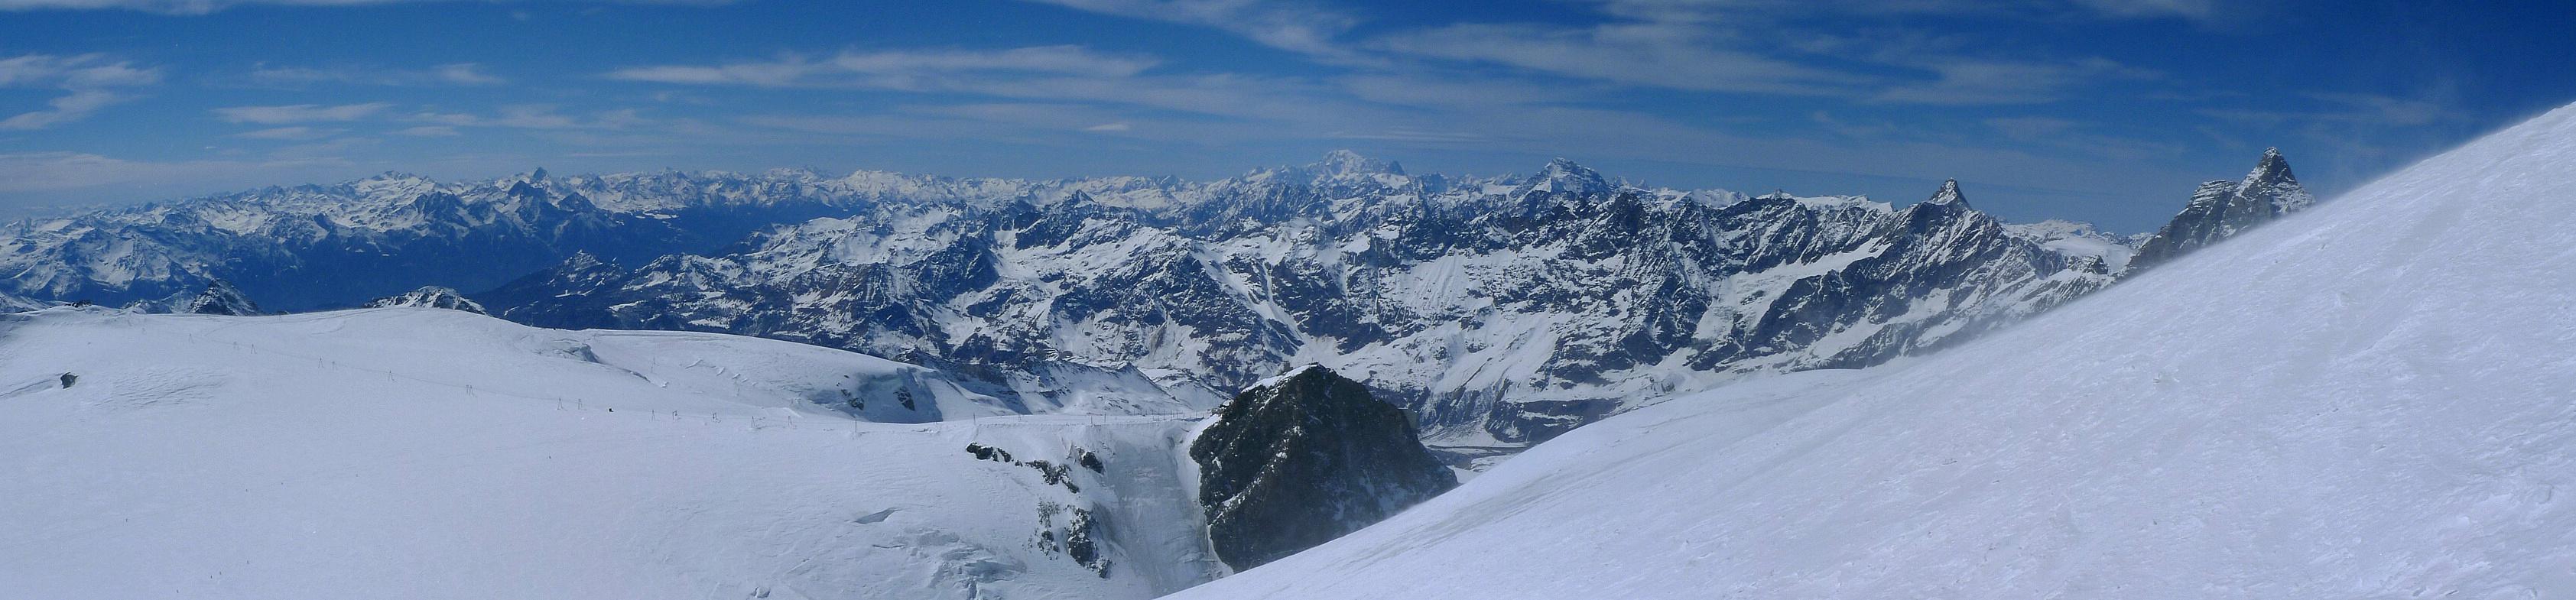 Breithorn - Zermatt Walliser Alpen / Alpes valaisannes Švýcarsko panorama 16